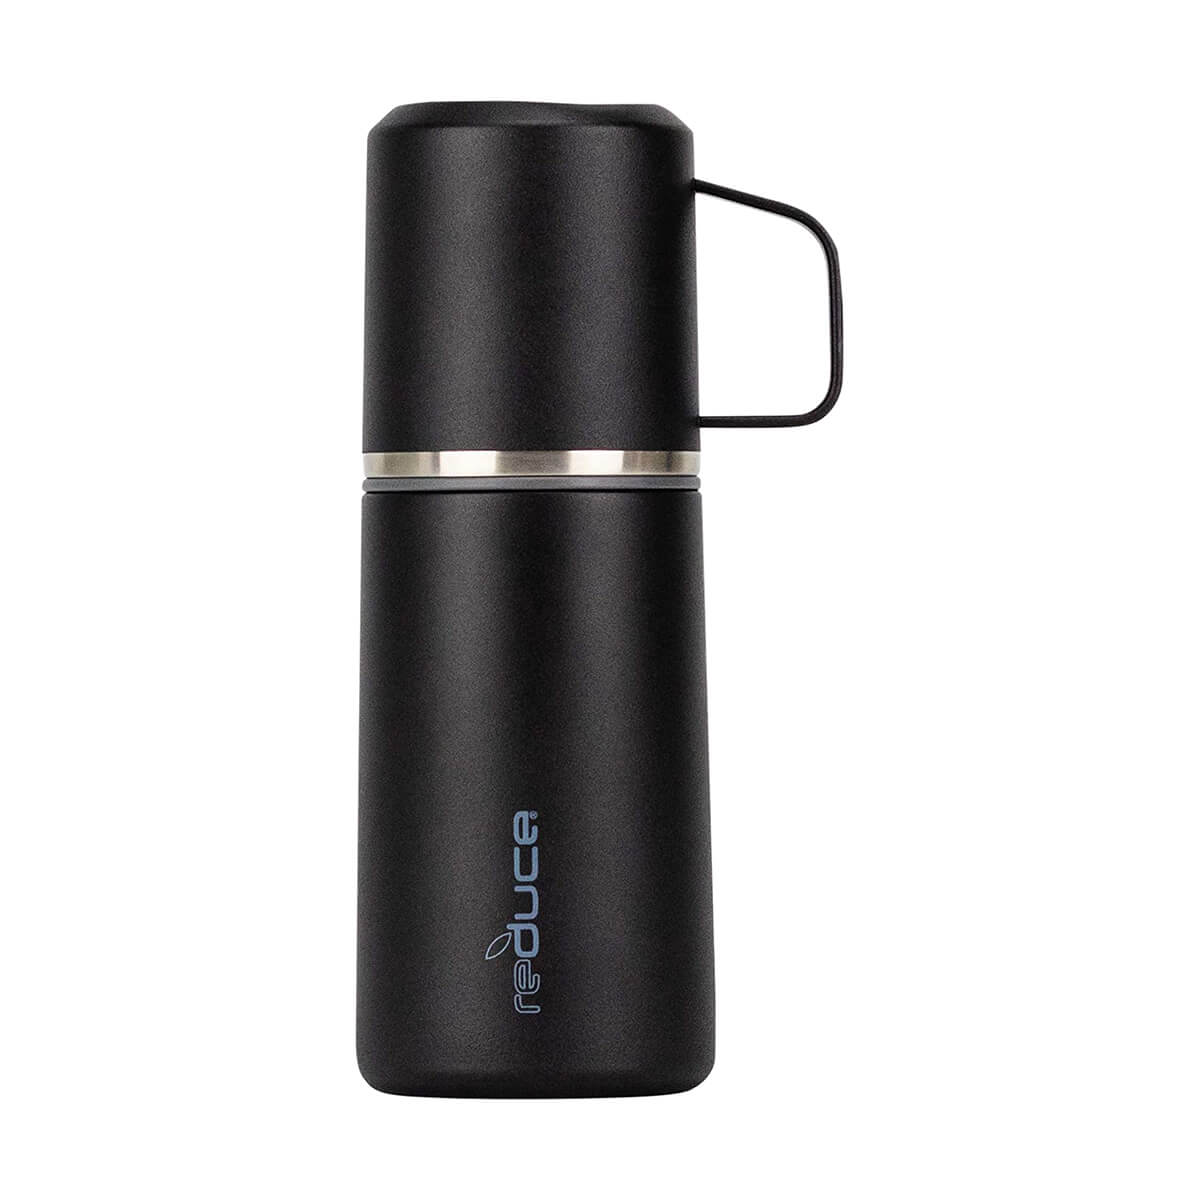 Flask - Performance - 34 oz - Black